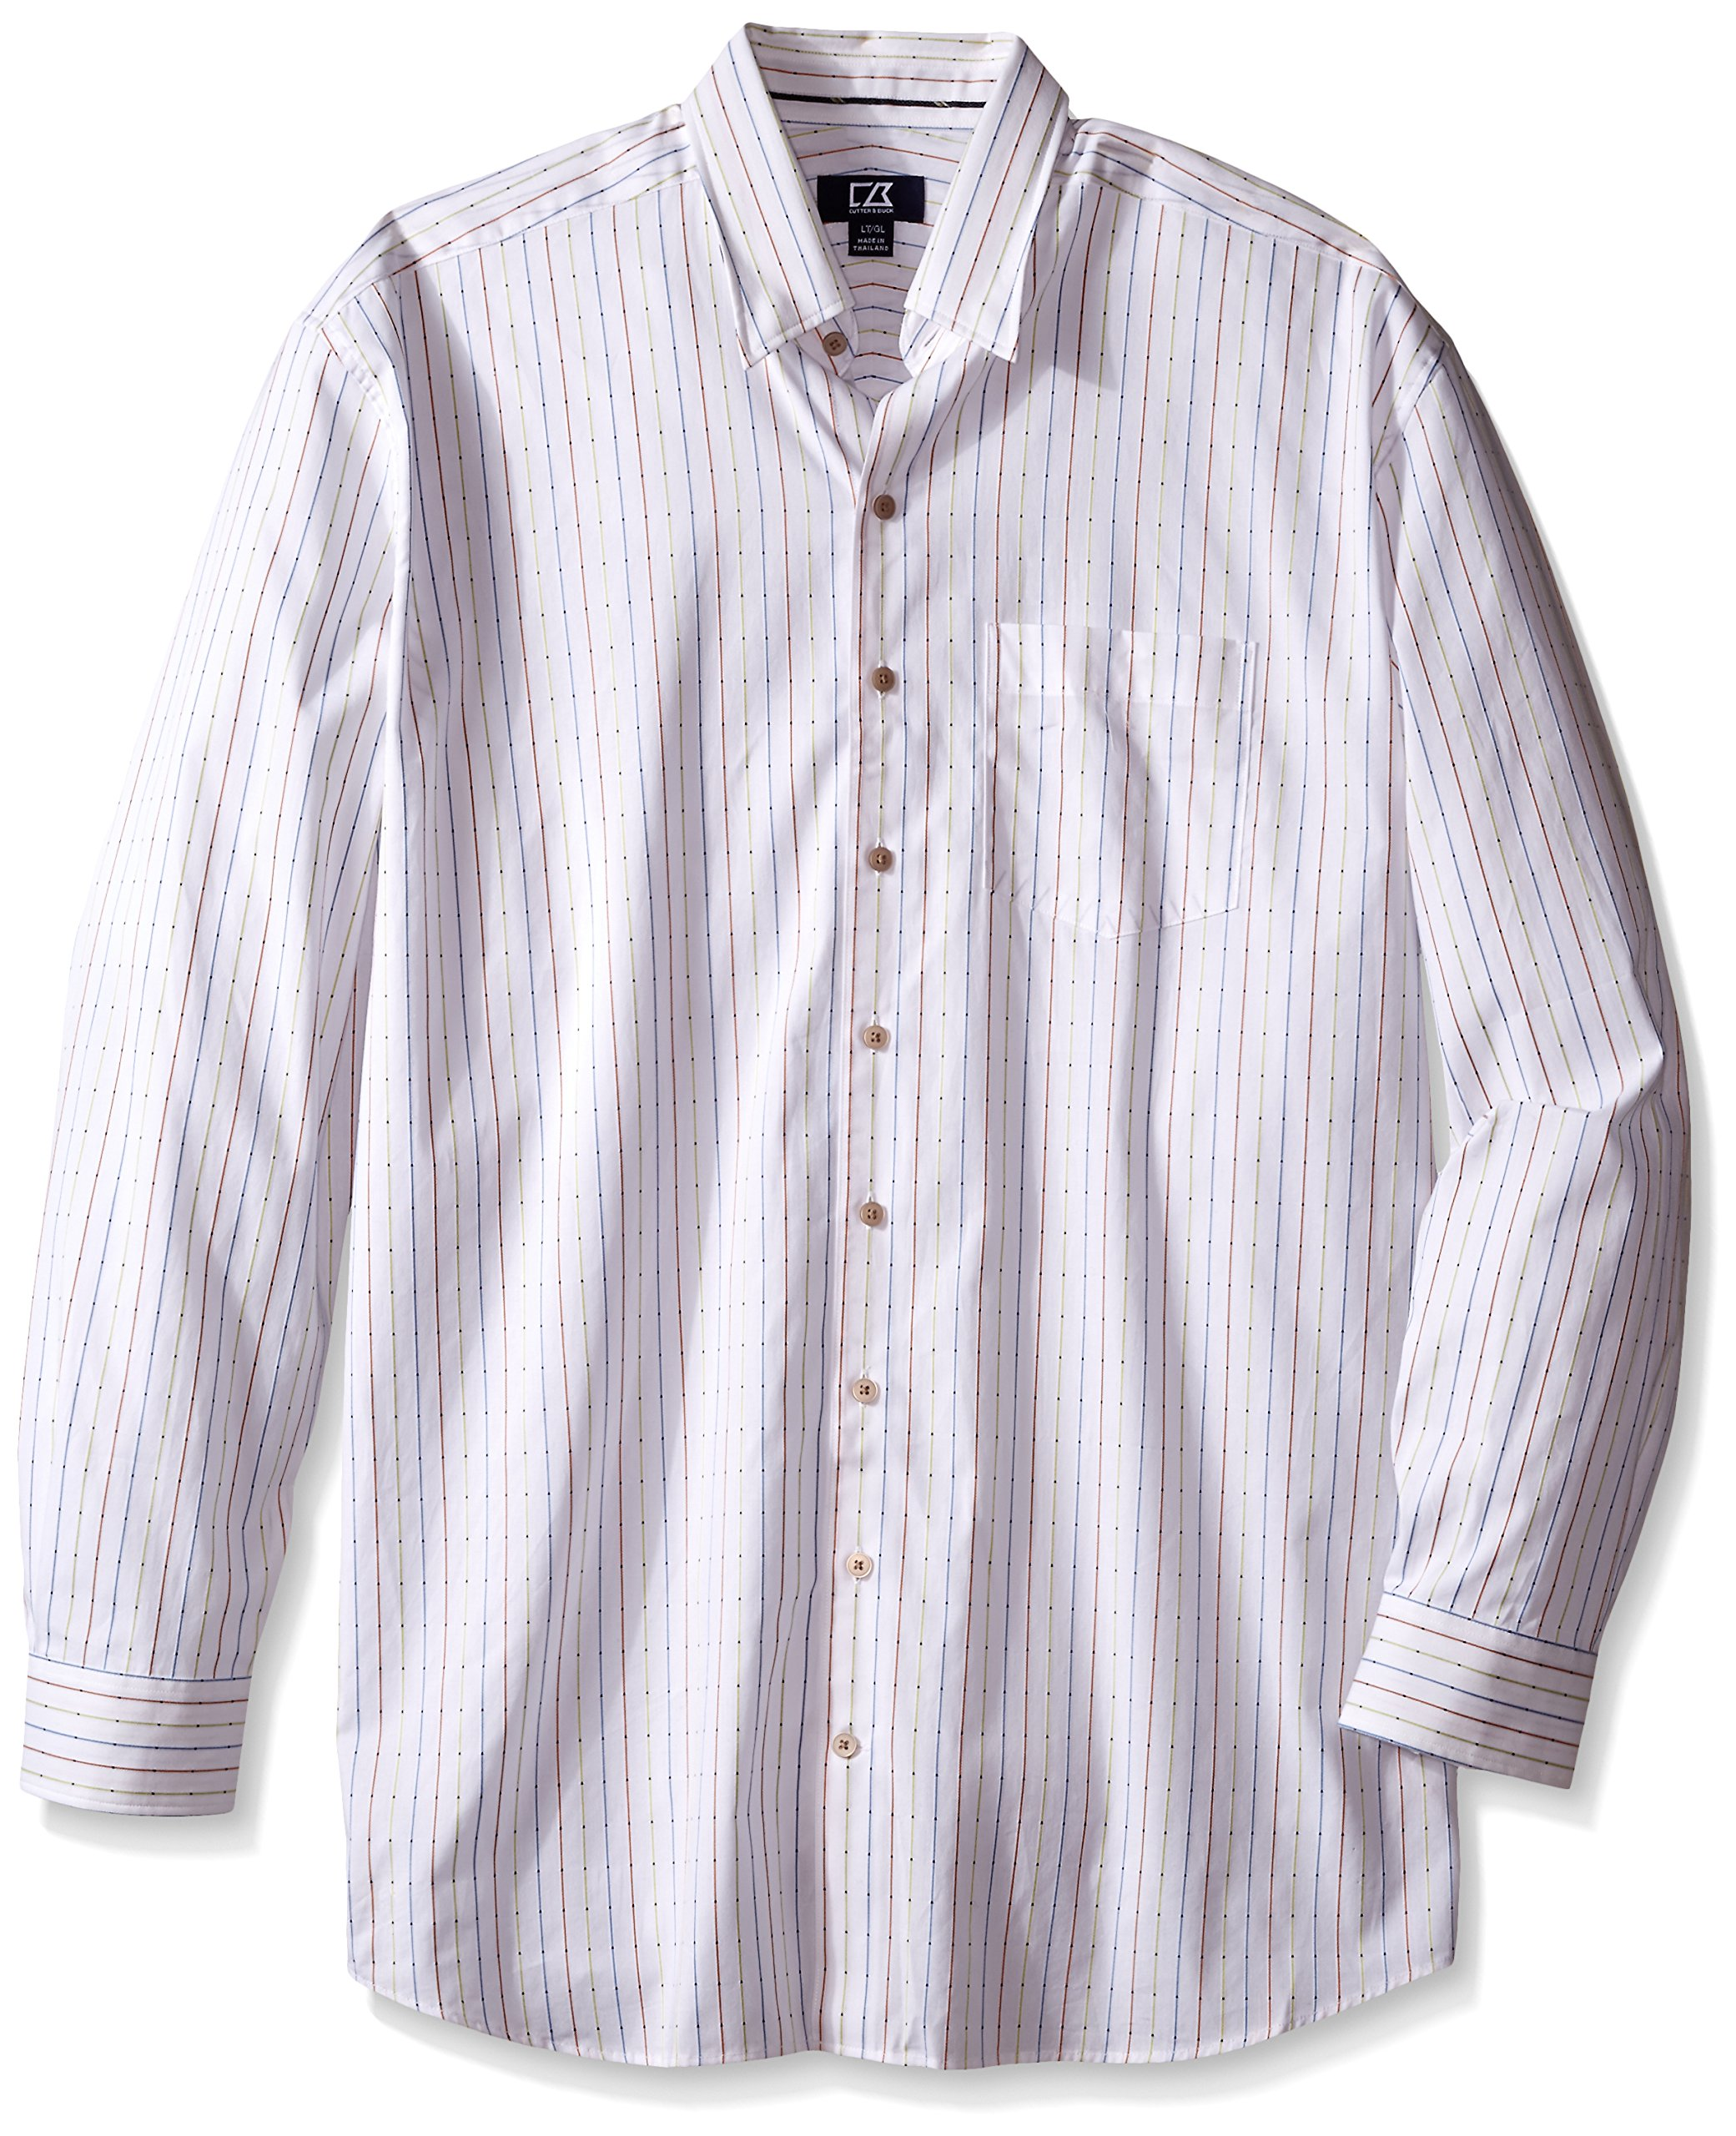 Cutter & Buck Men's Big and Tall Long Sleeve Lantern Stripe Shirt, Multi, 3X/Tall